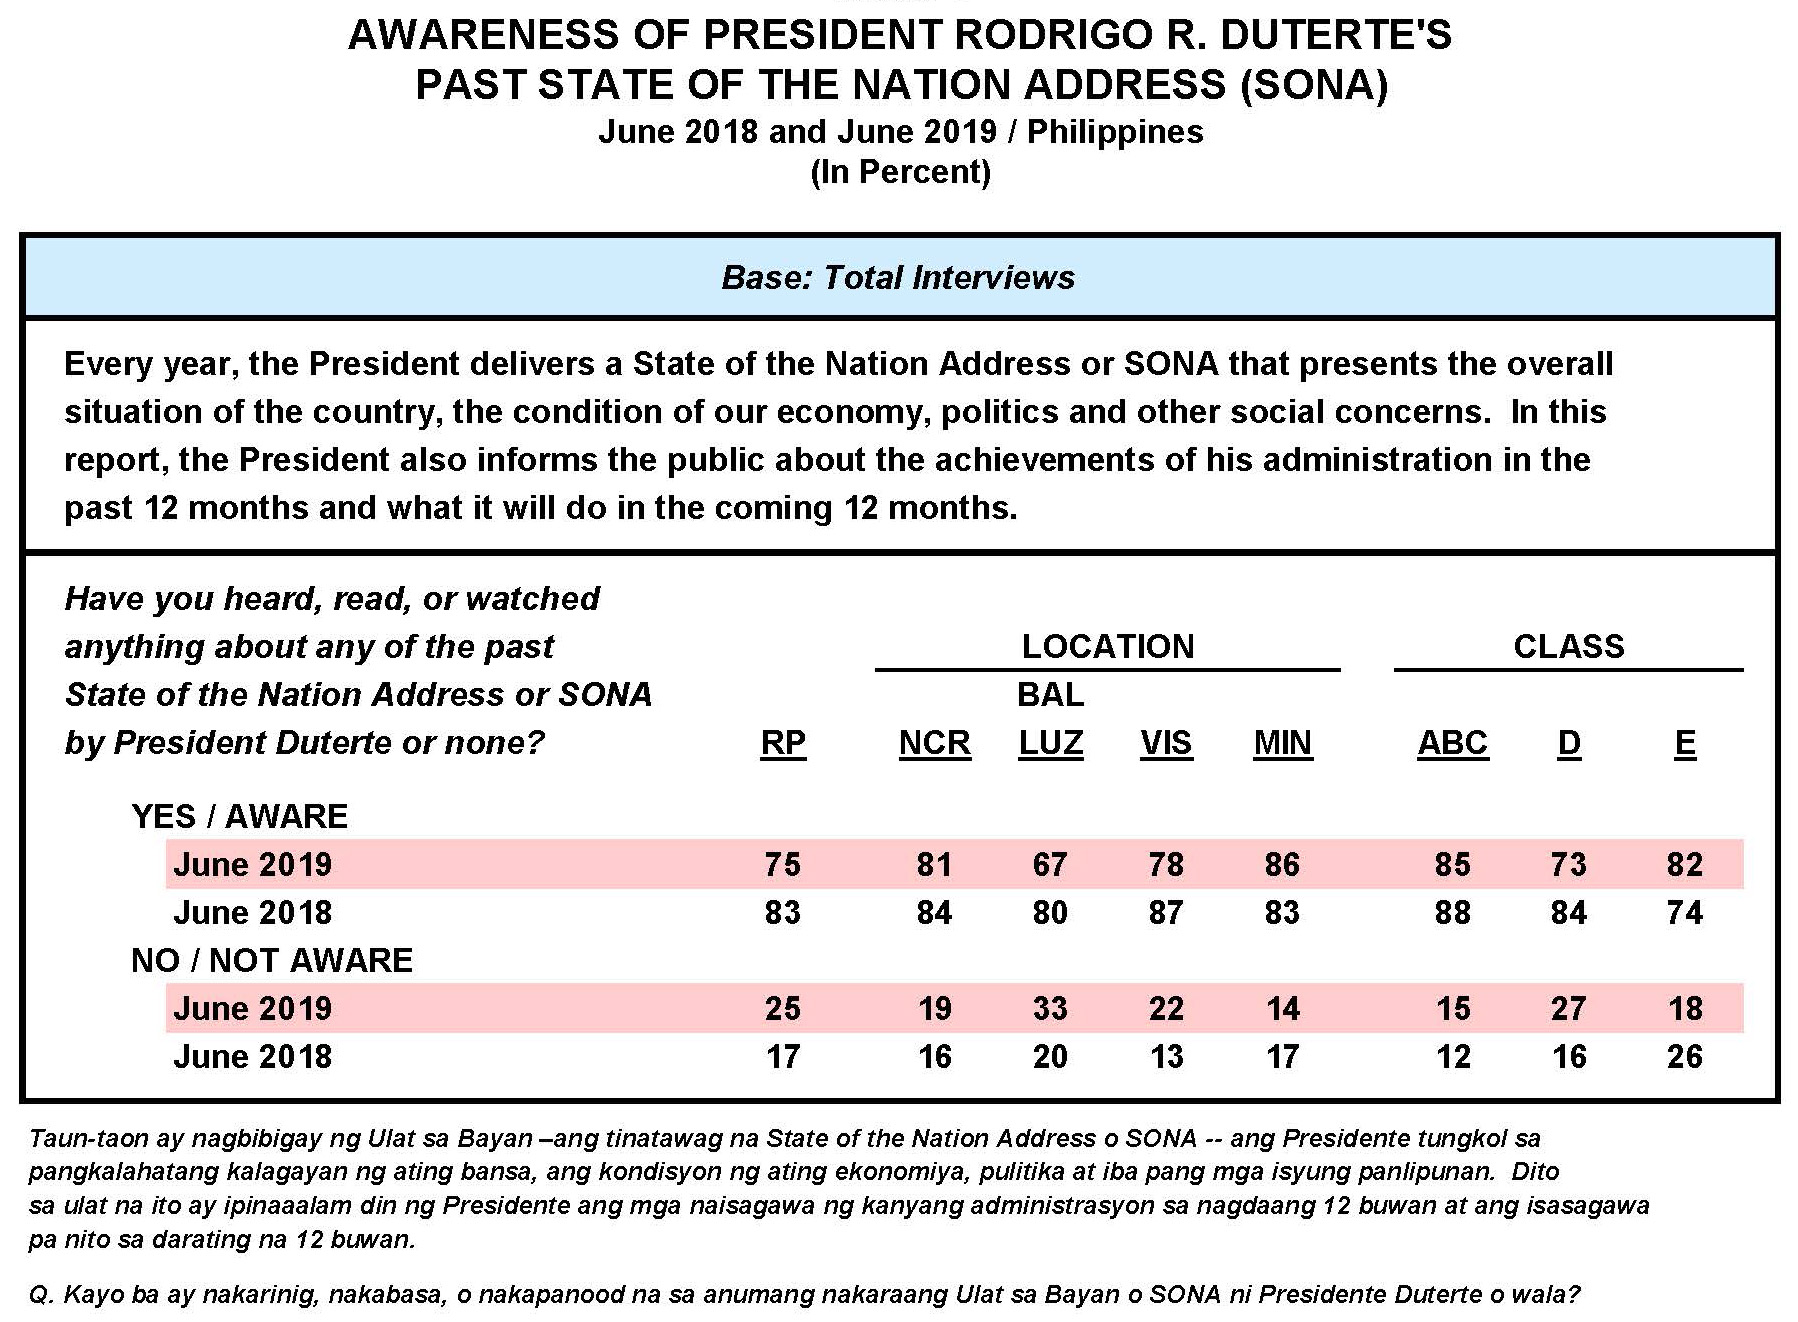 June 2019 Nationwide Survey on the State of the Nation Address (SONA) of President Rodrigo R. Duterte